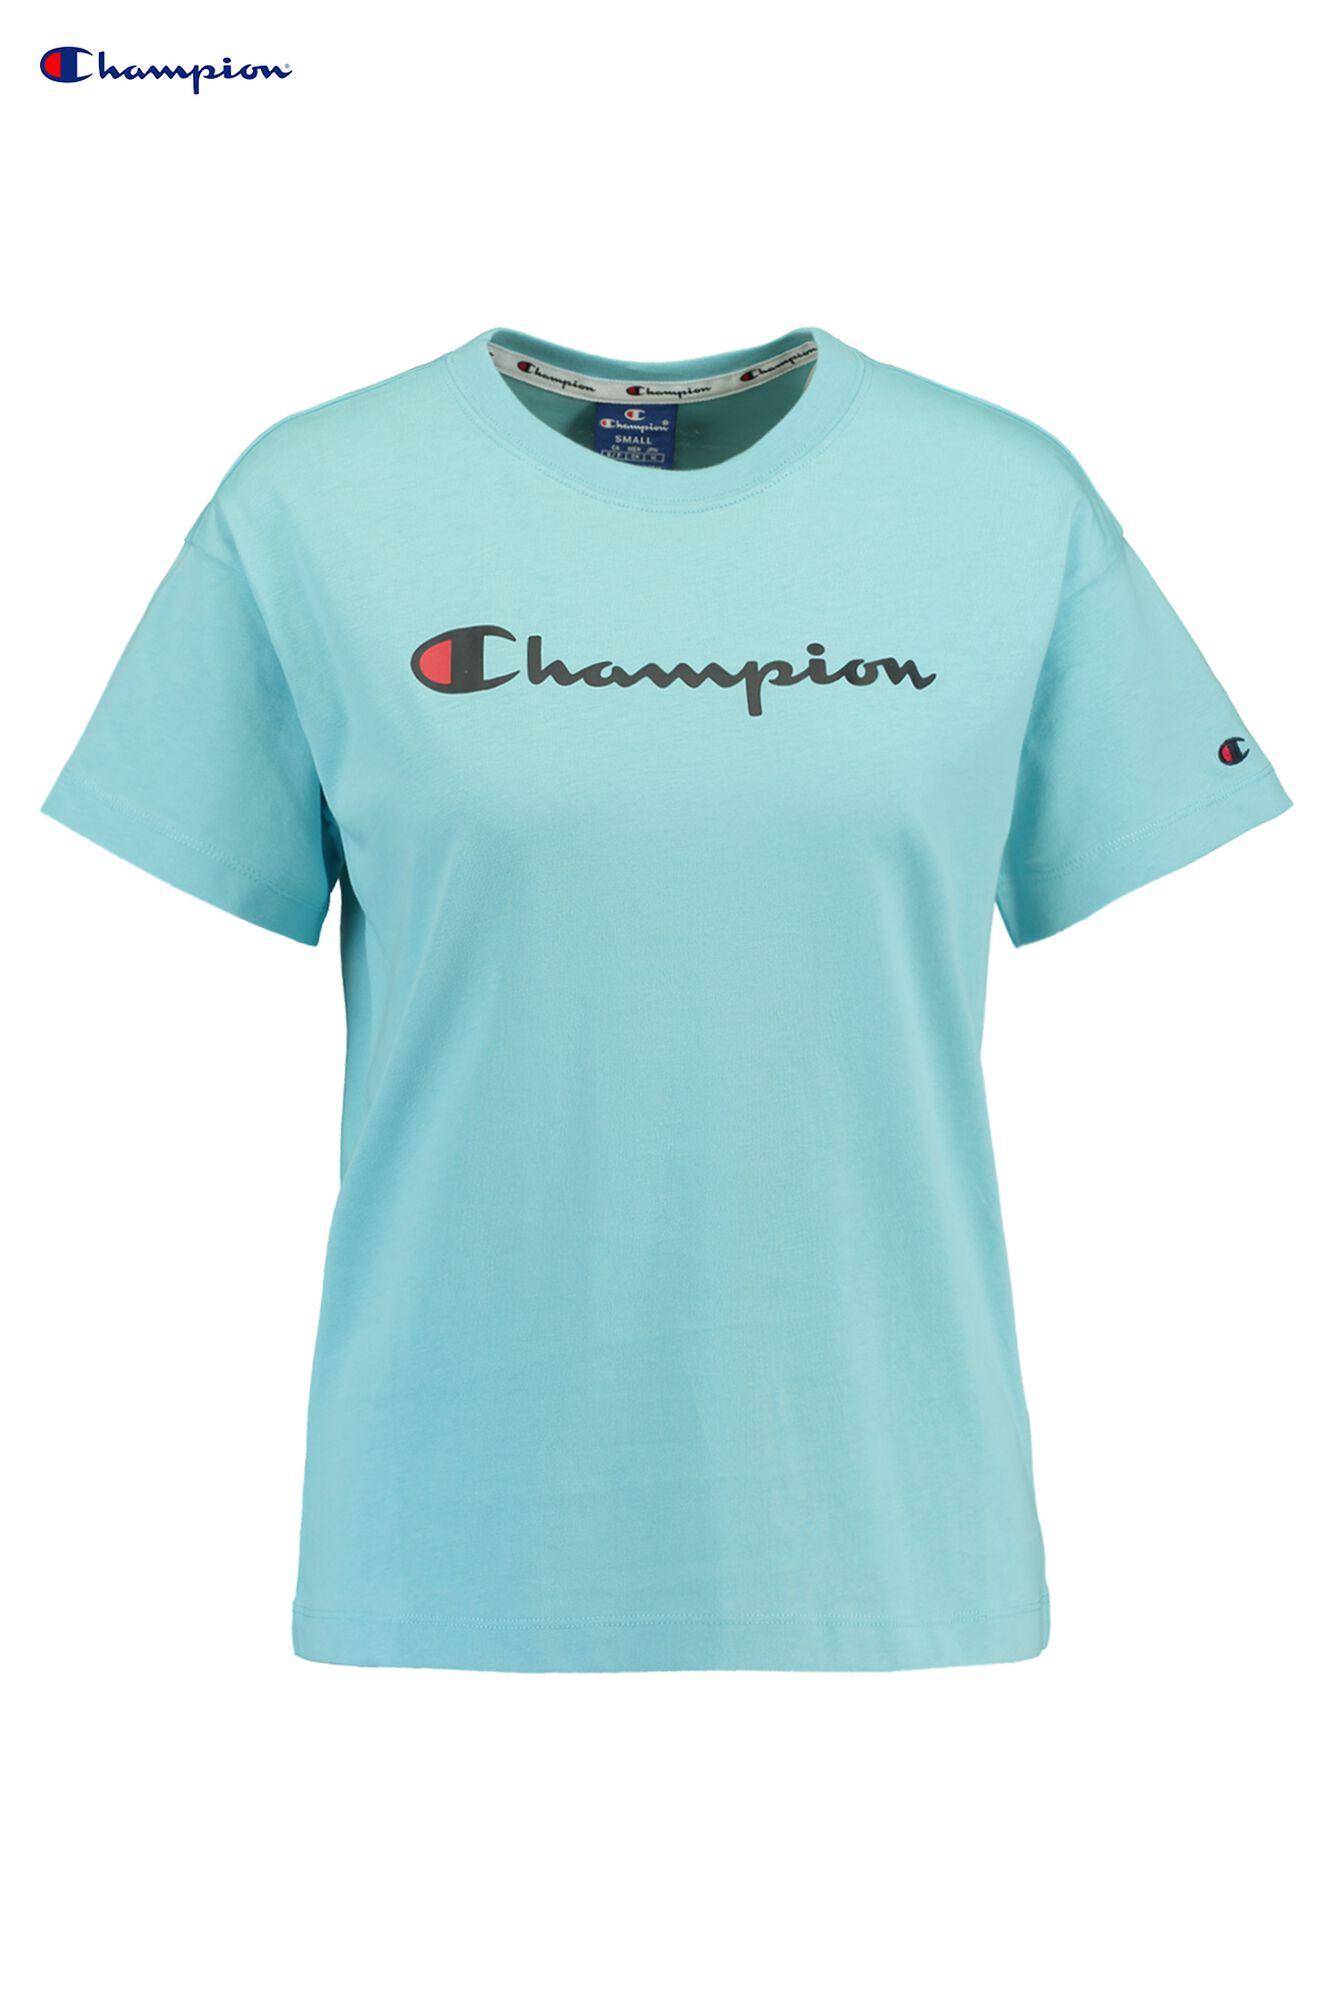 48e0dc9f3 Women T-shirt Champion American logo Blue Buy Online